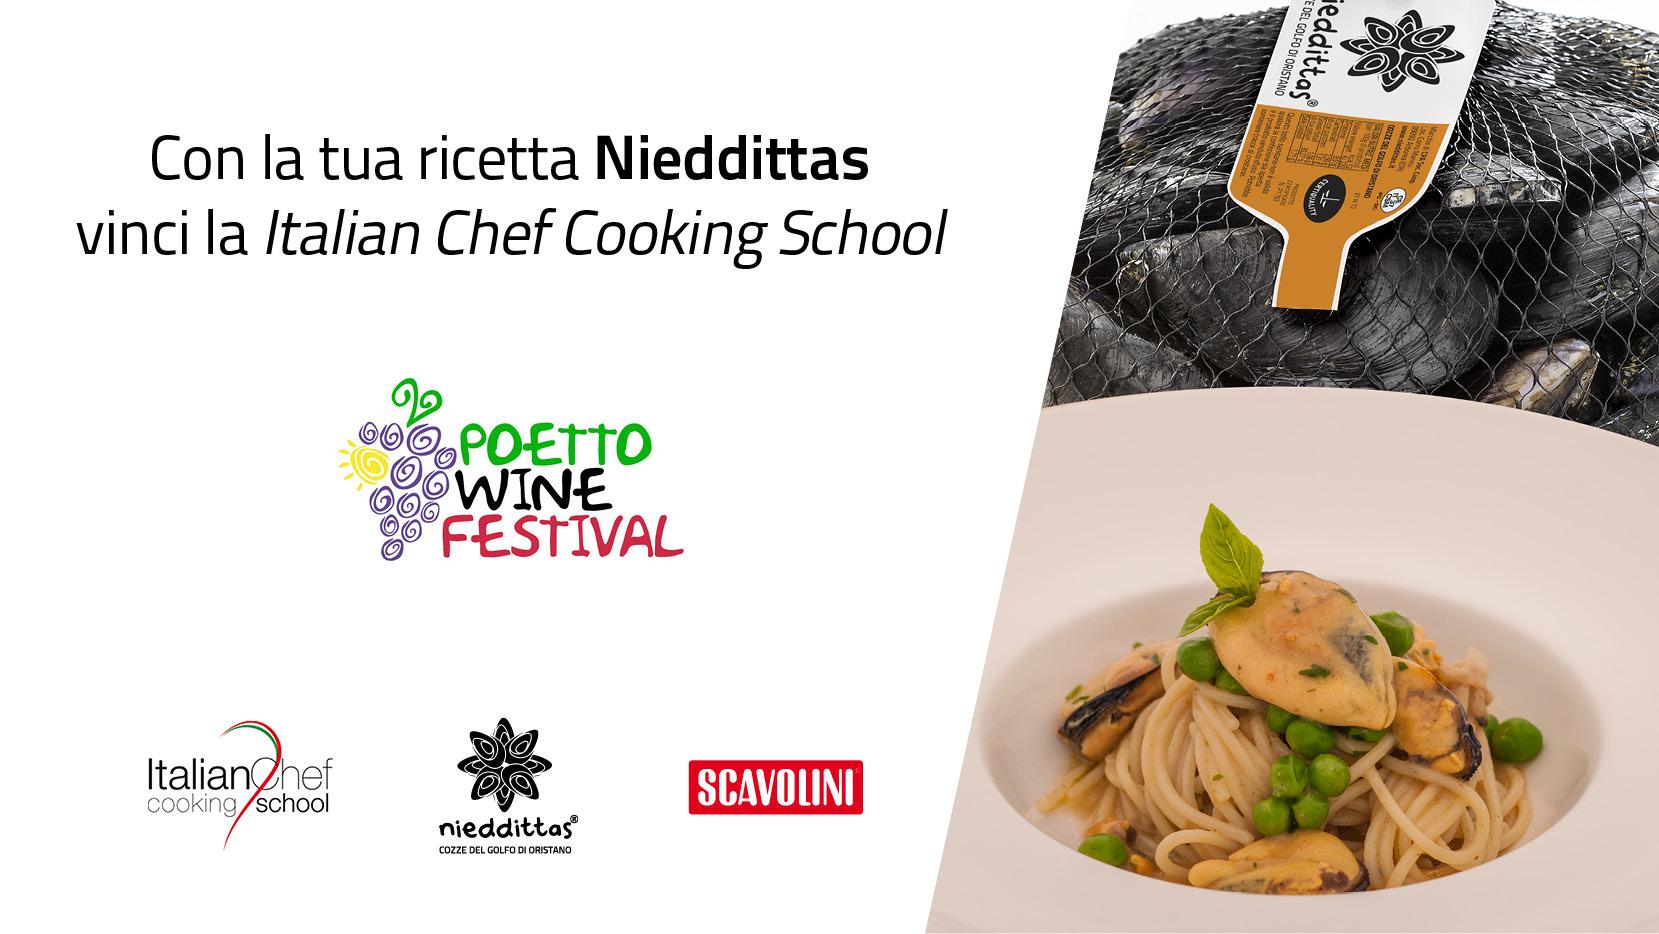 Con Nieddittas vinci una borsa di studio alla Italian Chef Cooking School.